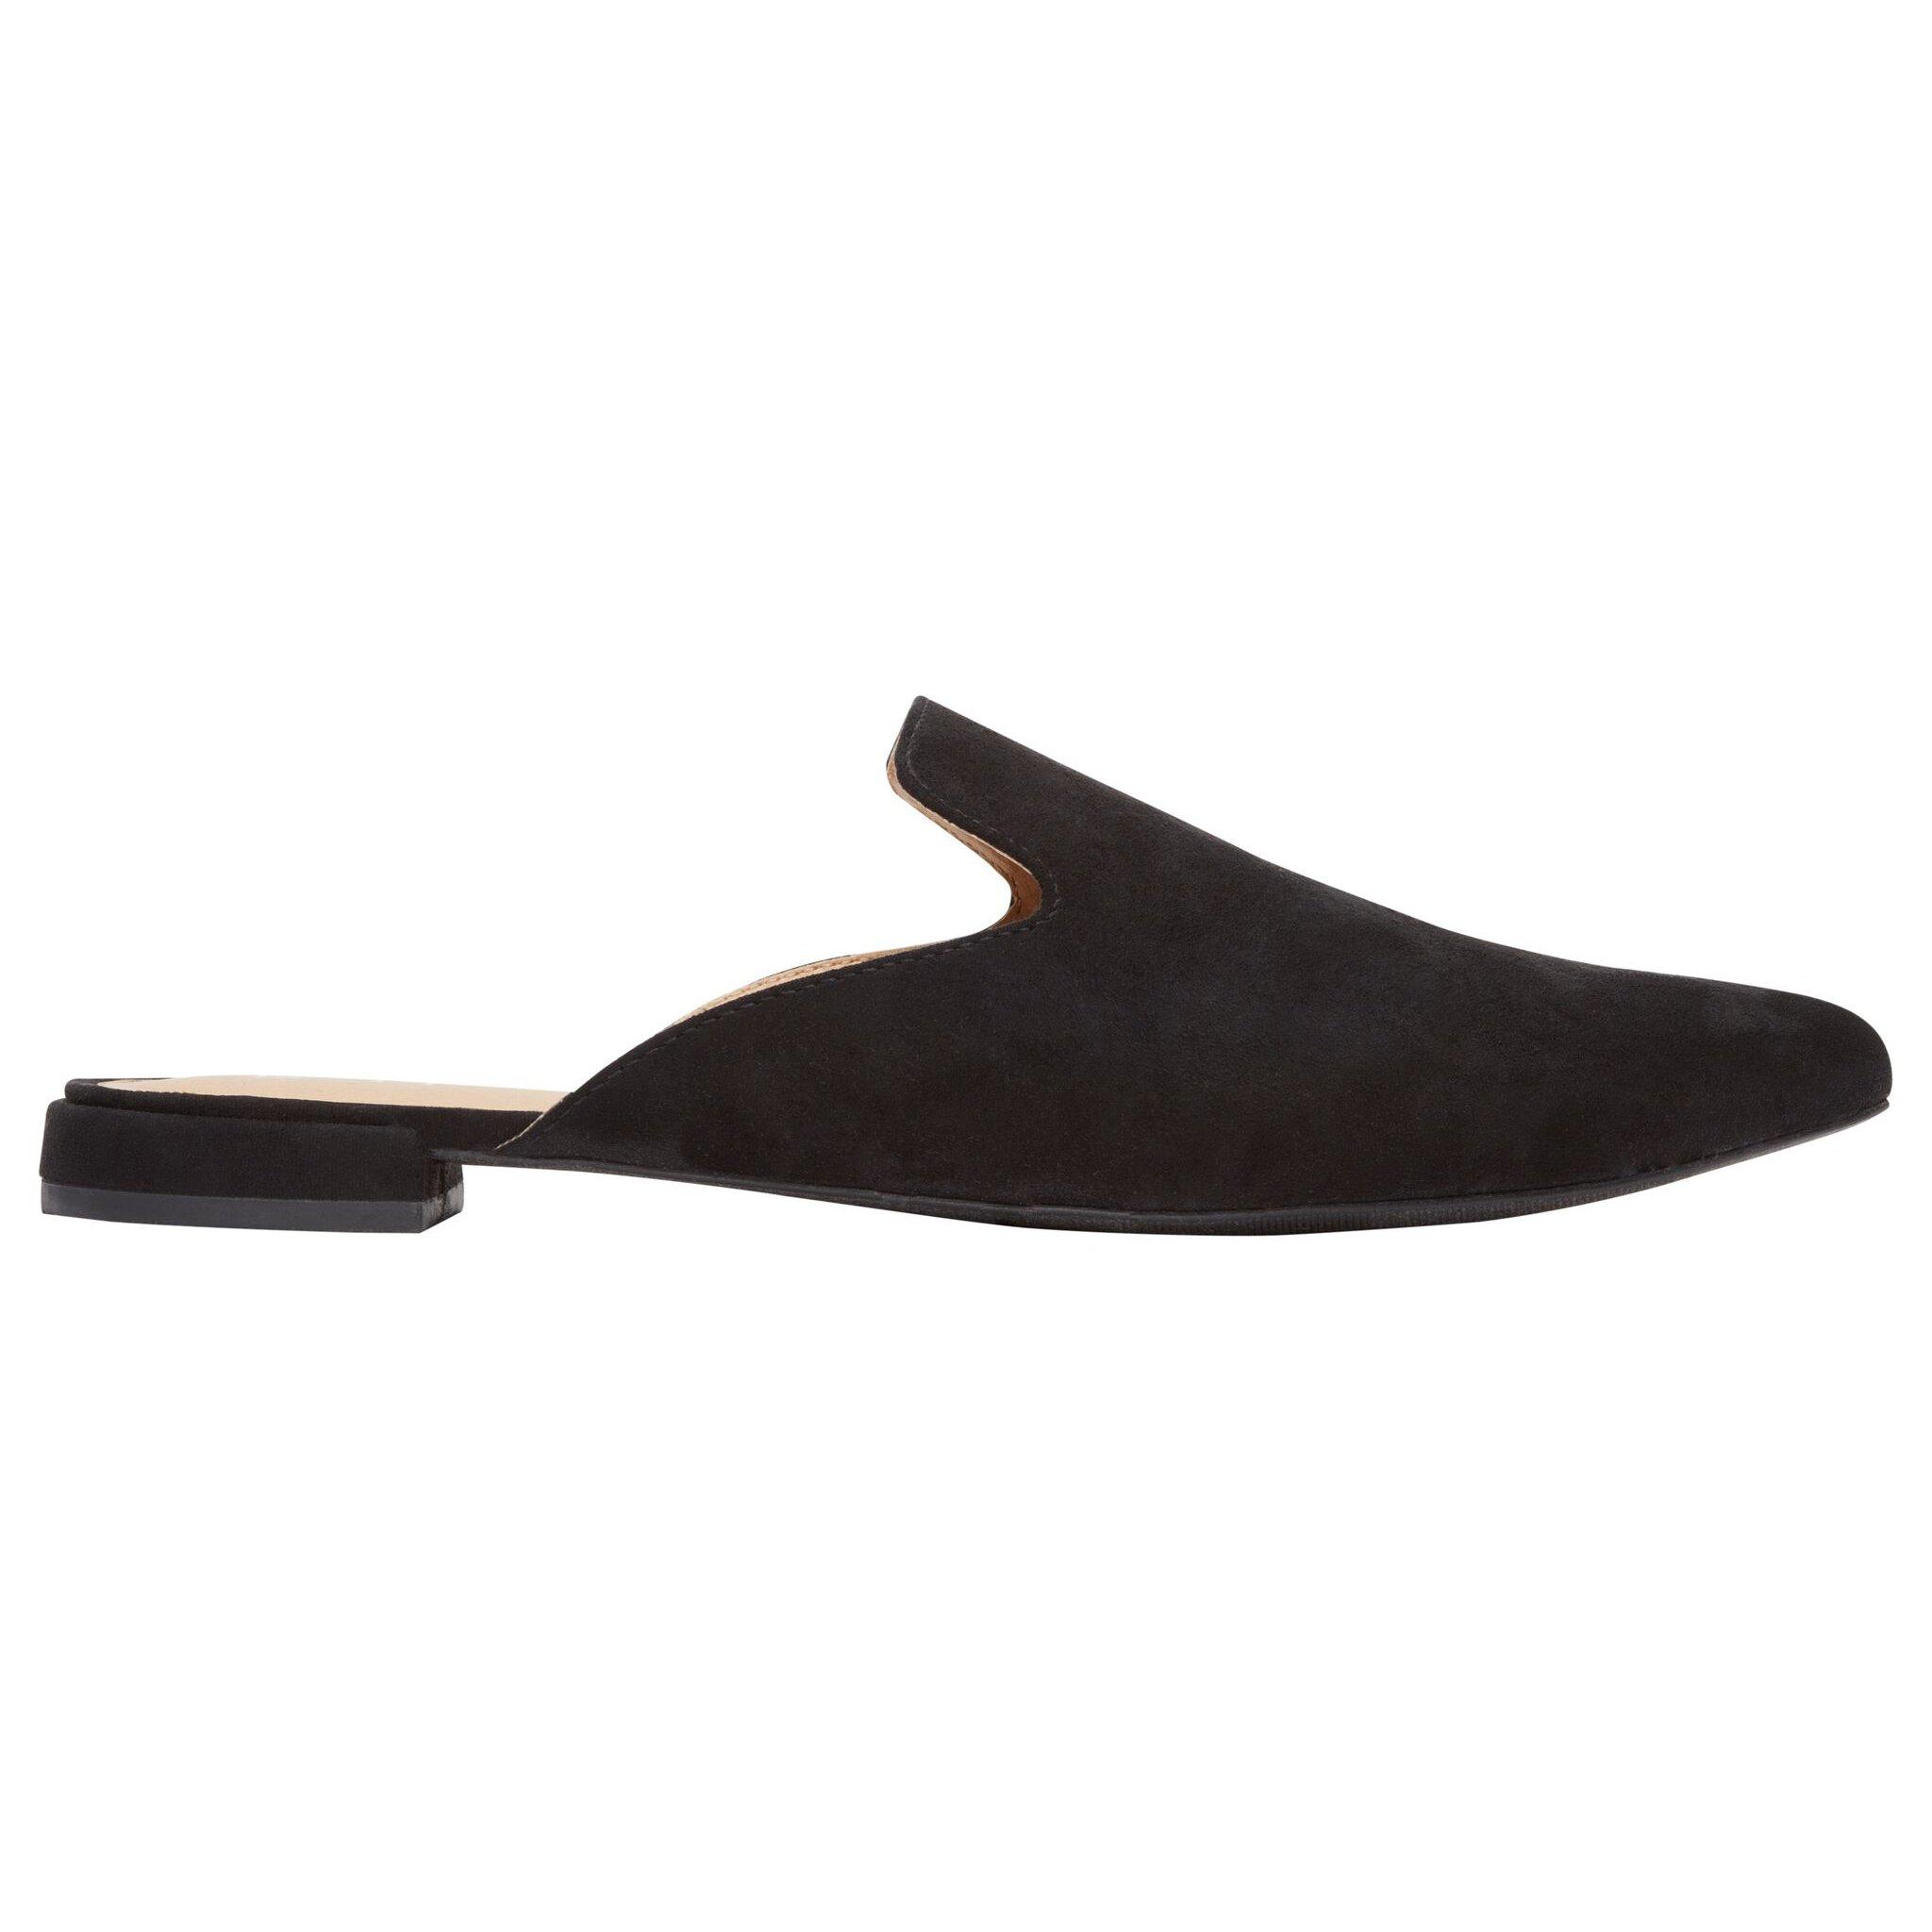 Rohb by Joyce Azria Maison Almond Toe Mule (Black) Size 9.5